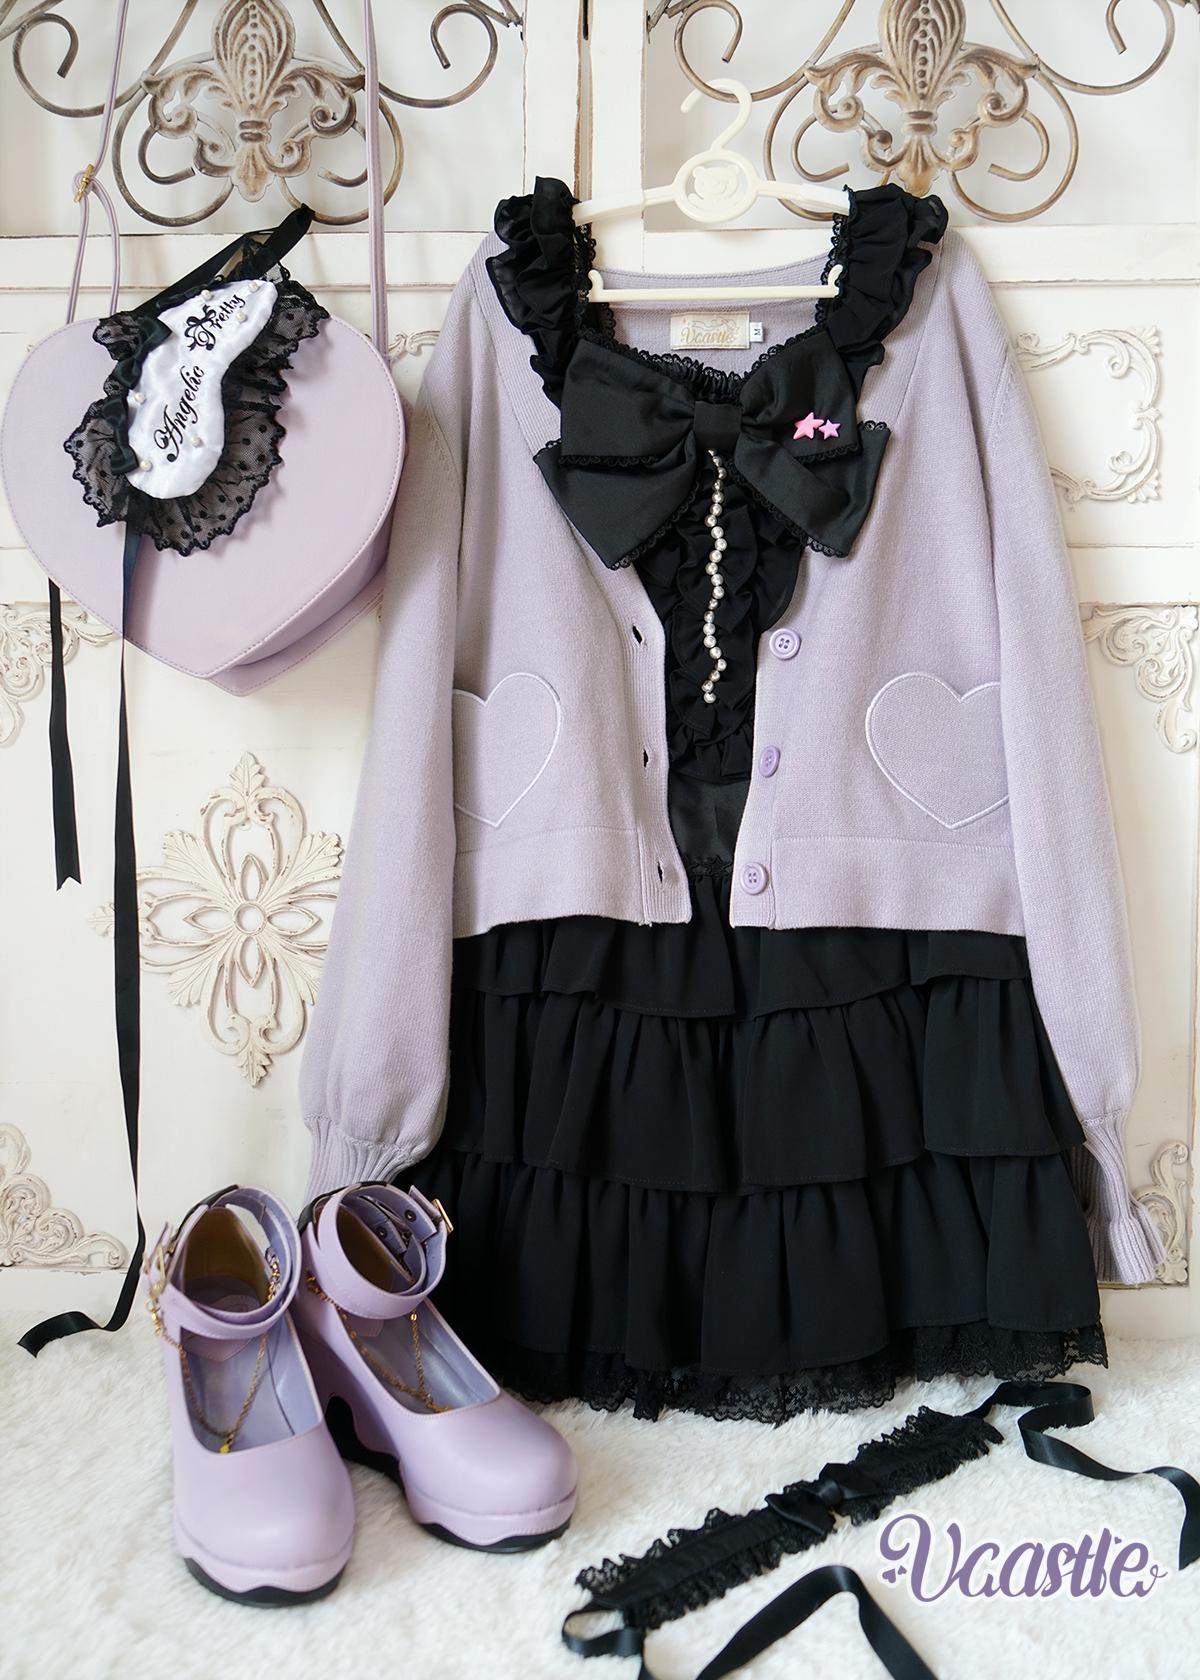 【Vcastle】【新春打折】原创-可可洛- 爱心lolita毛衣开衫外套